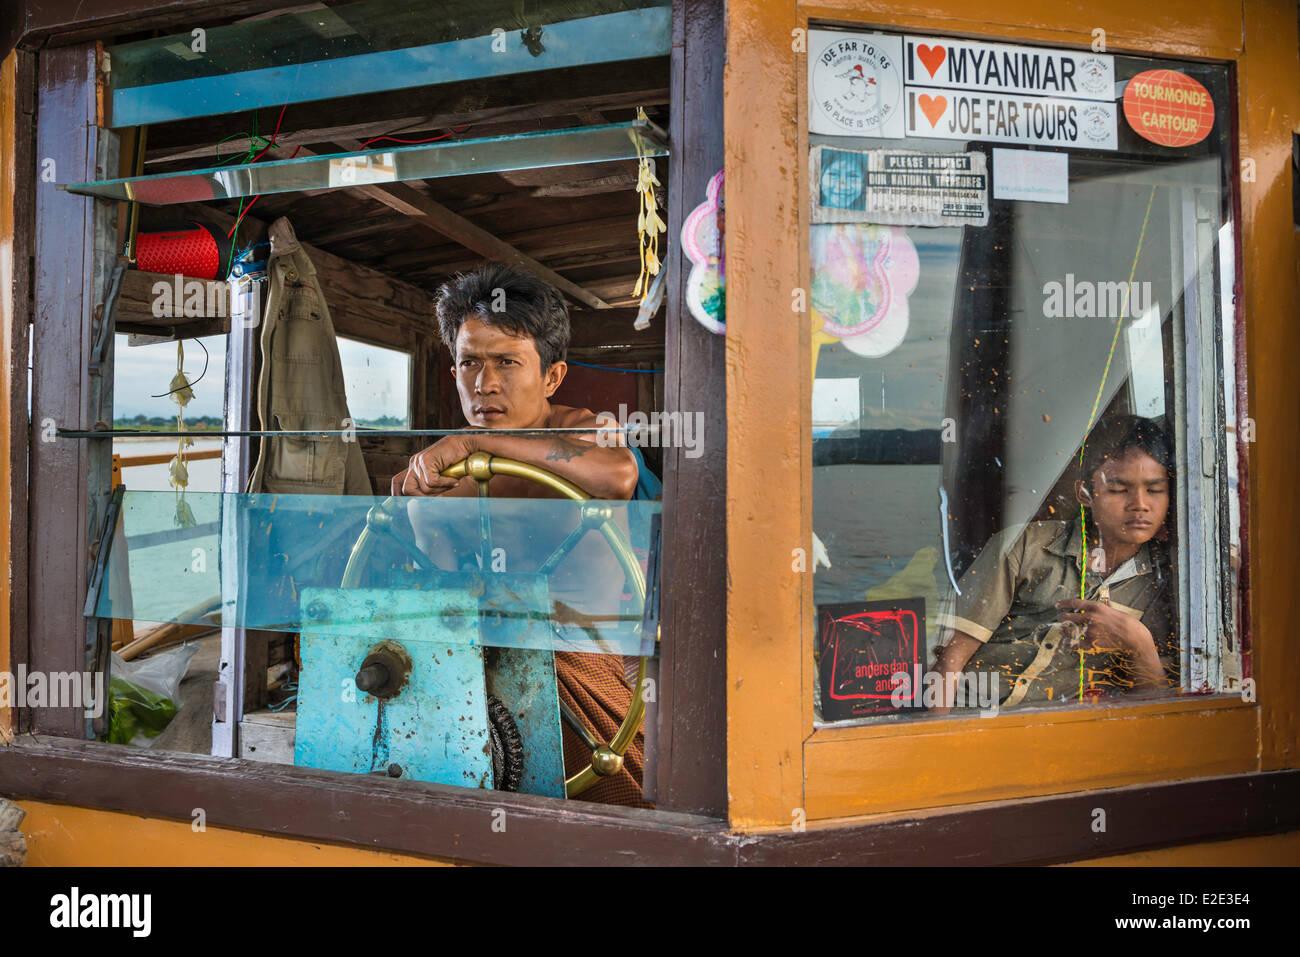 Myanmar (Birmania) Divisione Mandalay Mandalay fiume Irrawady capitano della barca da Mandalay a Mingun Immagini Stock